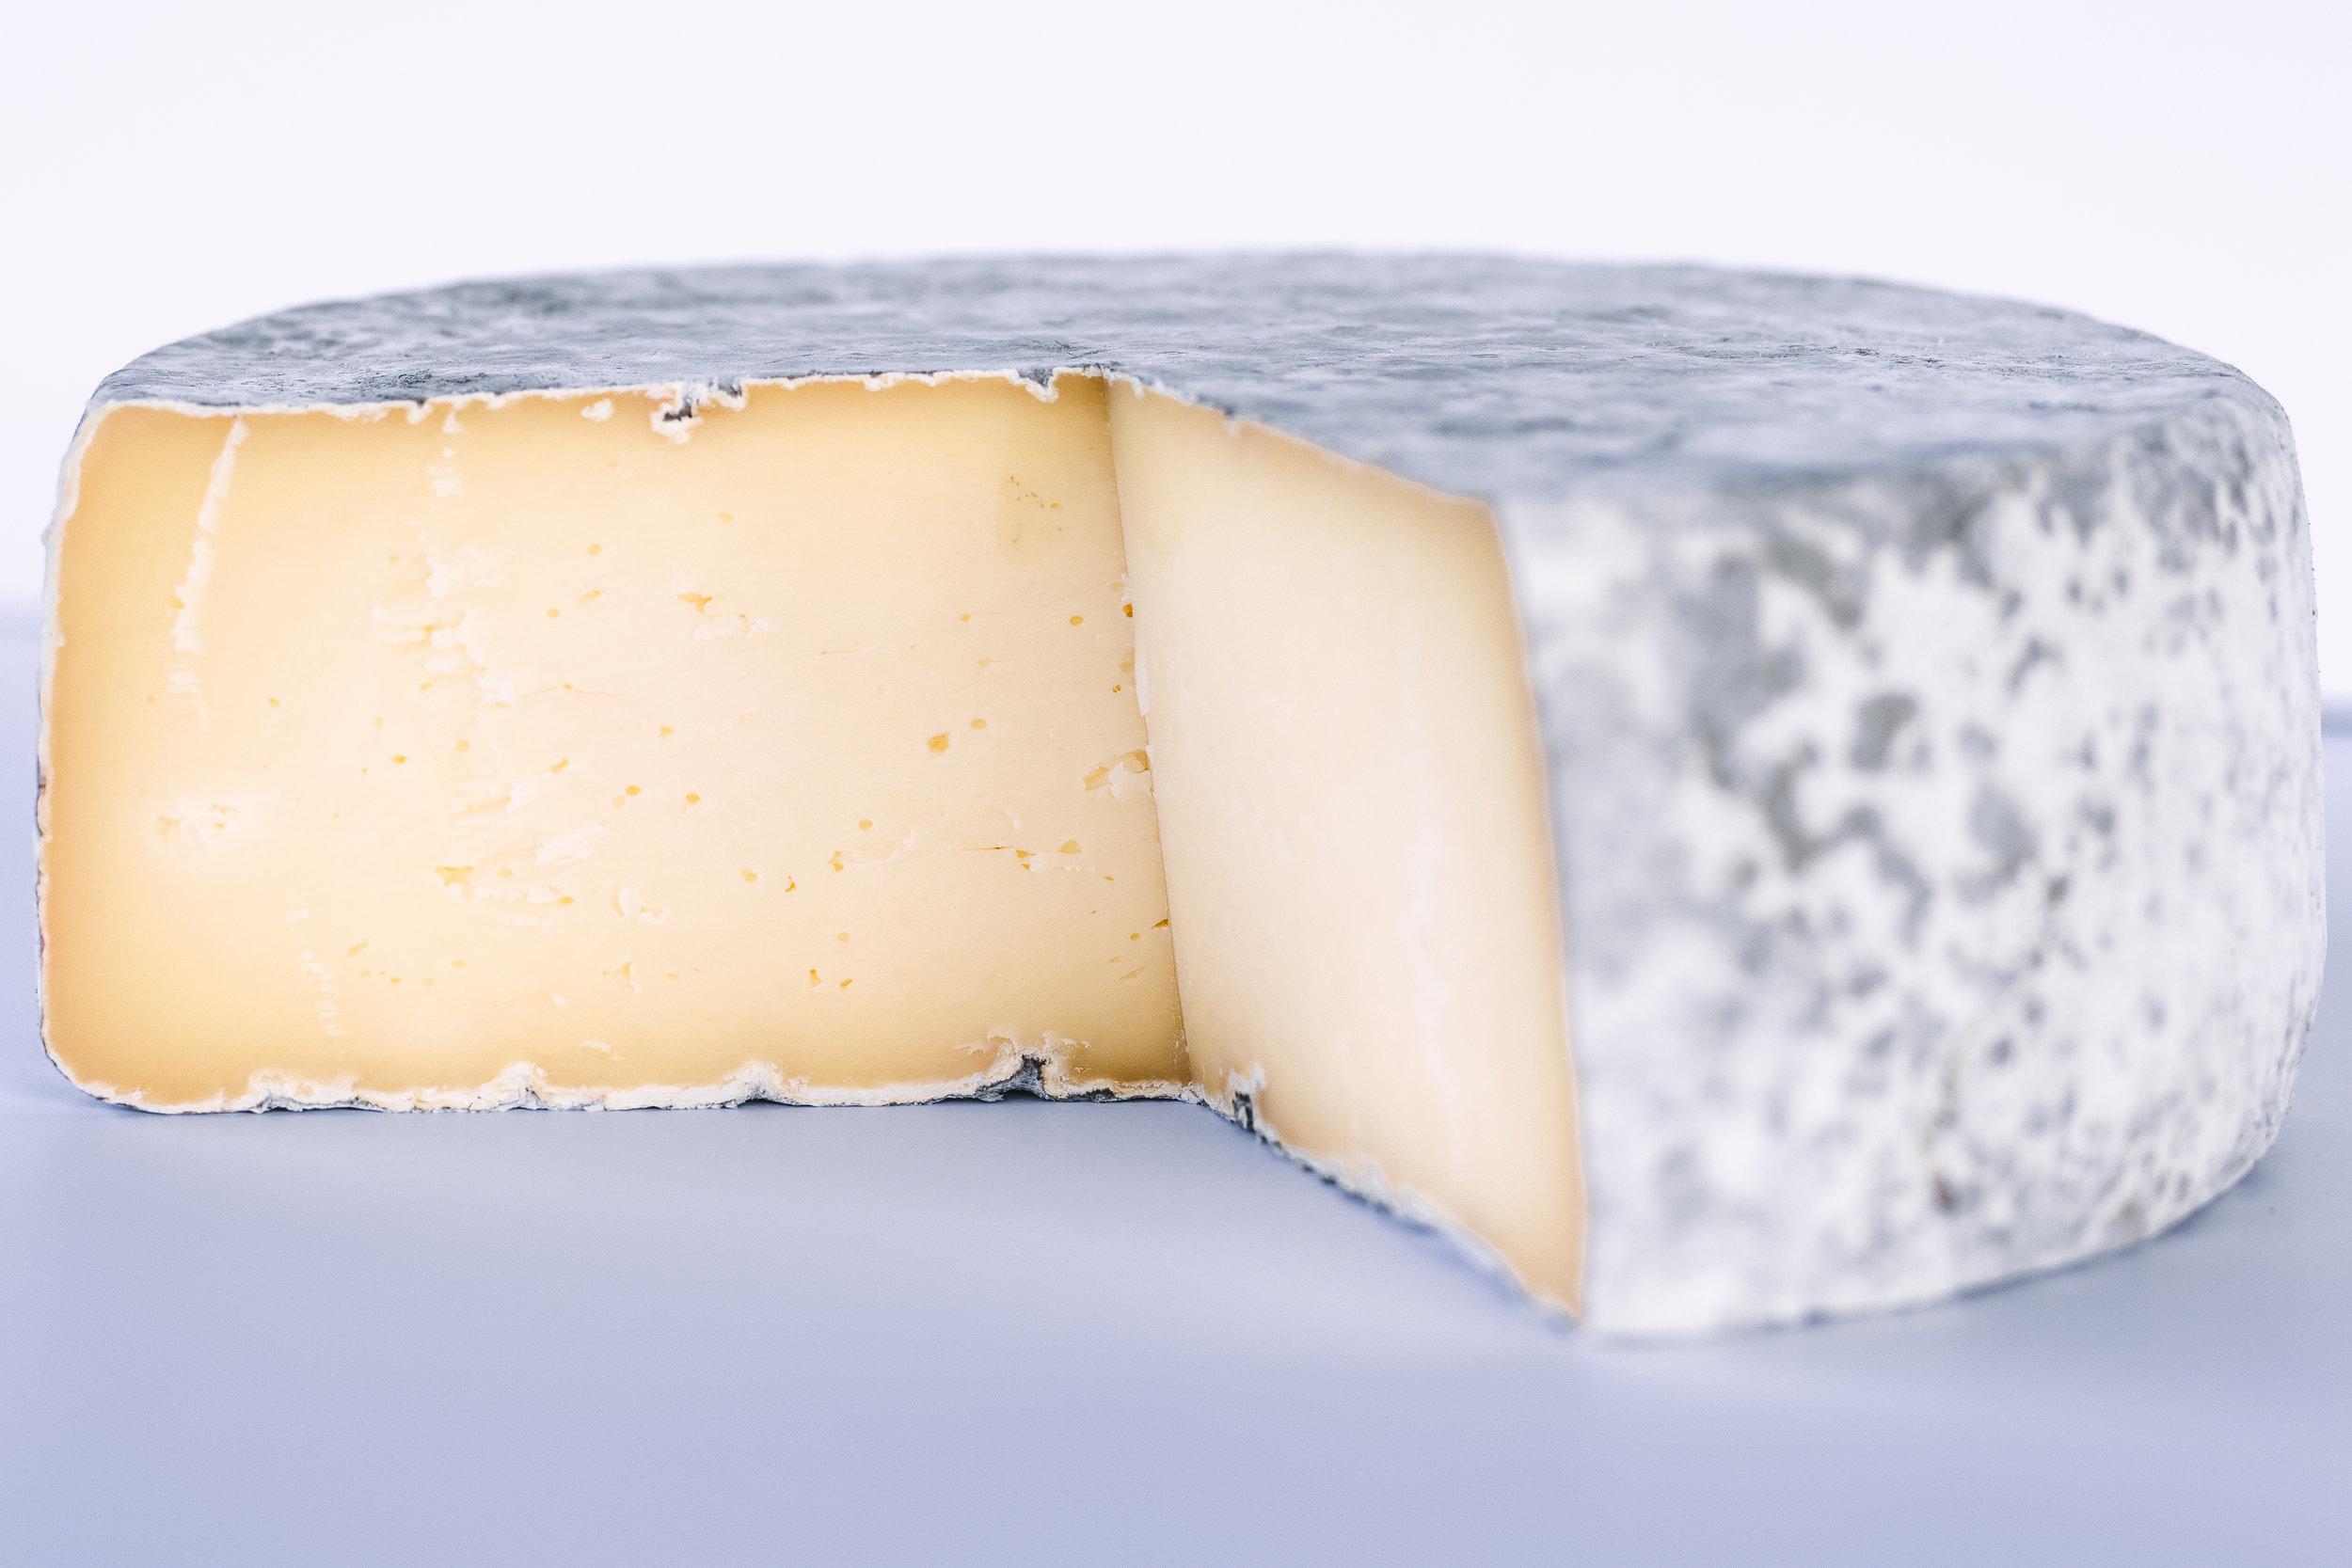 Cumberland - Raw Milk/Aged 90 Days (more info)